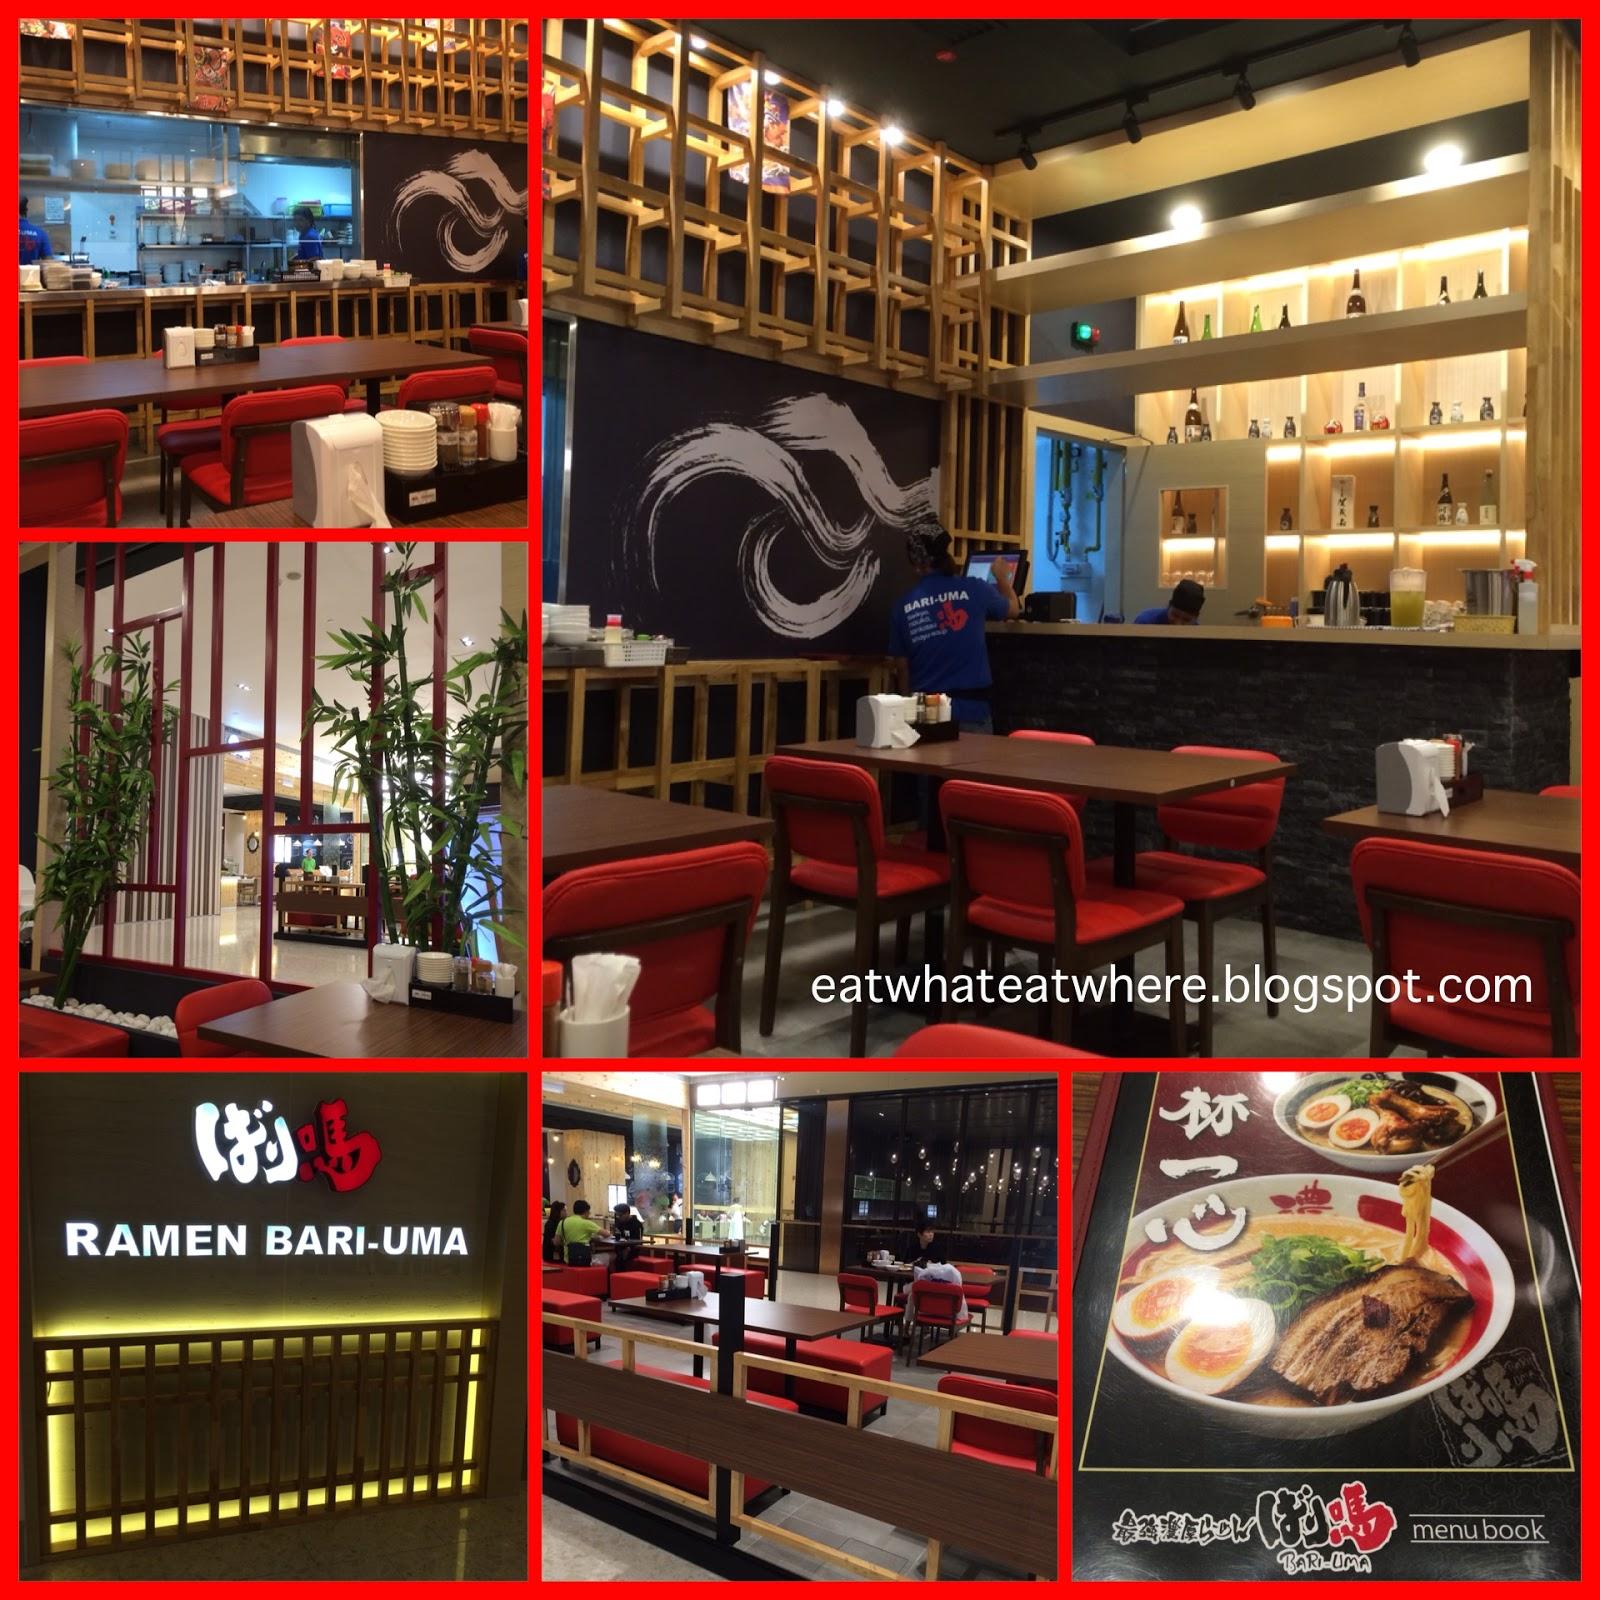 Eat what, Eat where?: Ramen Bari-Uma @ Pavilion Elite